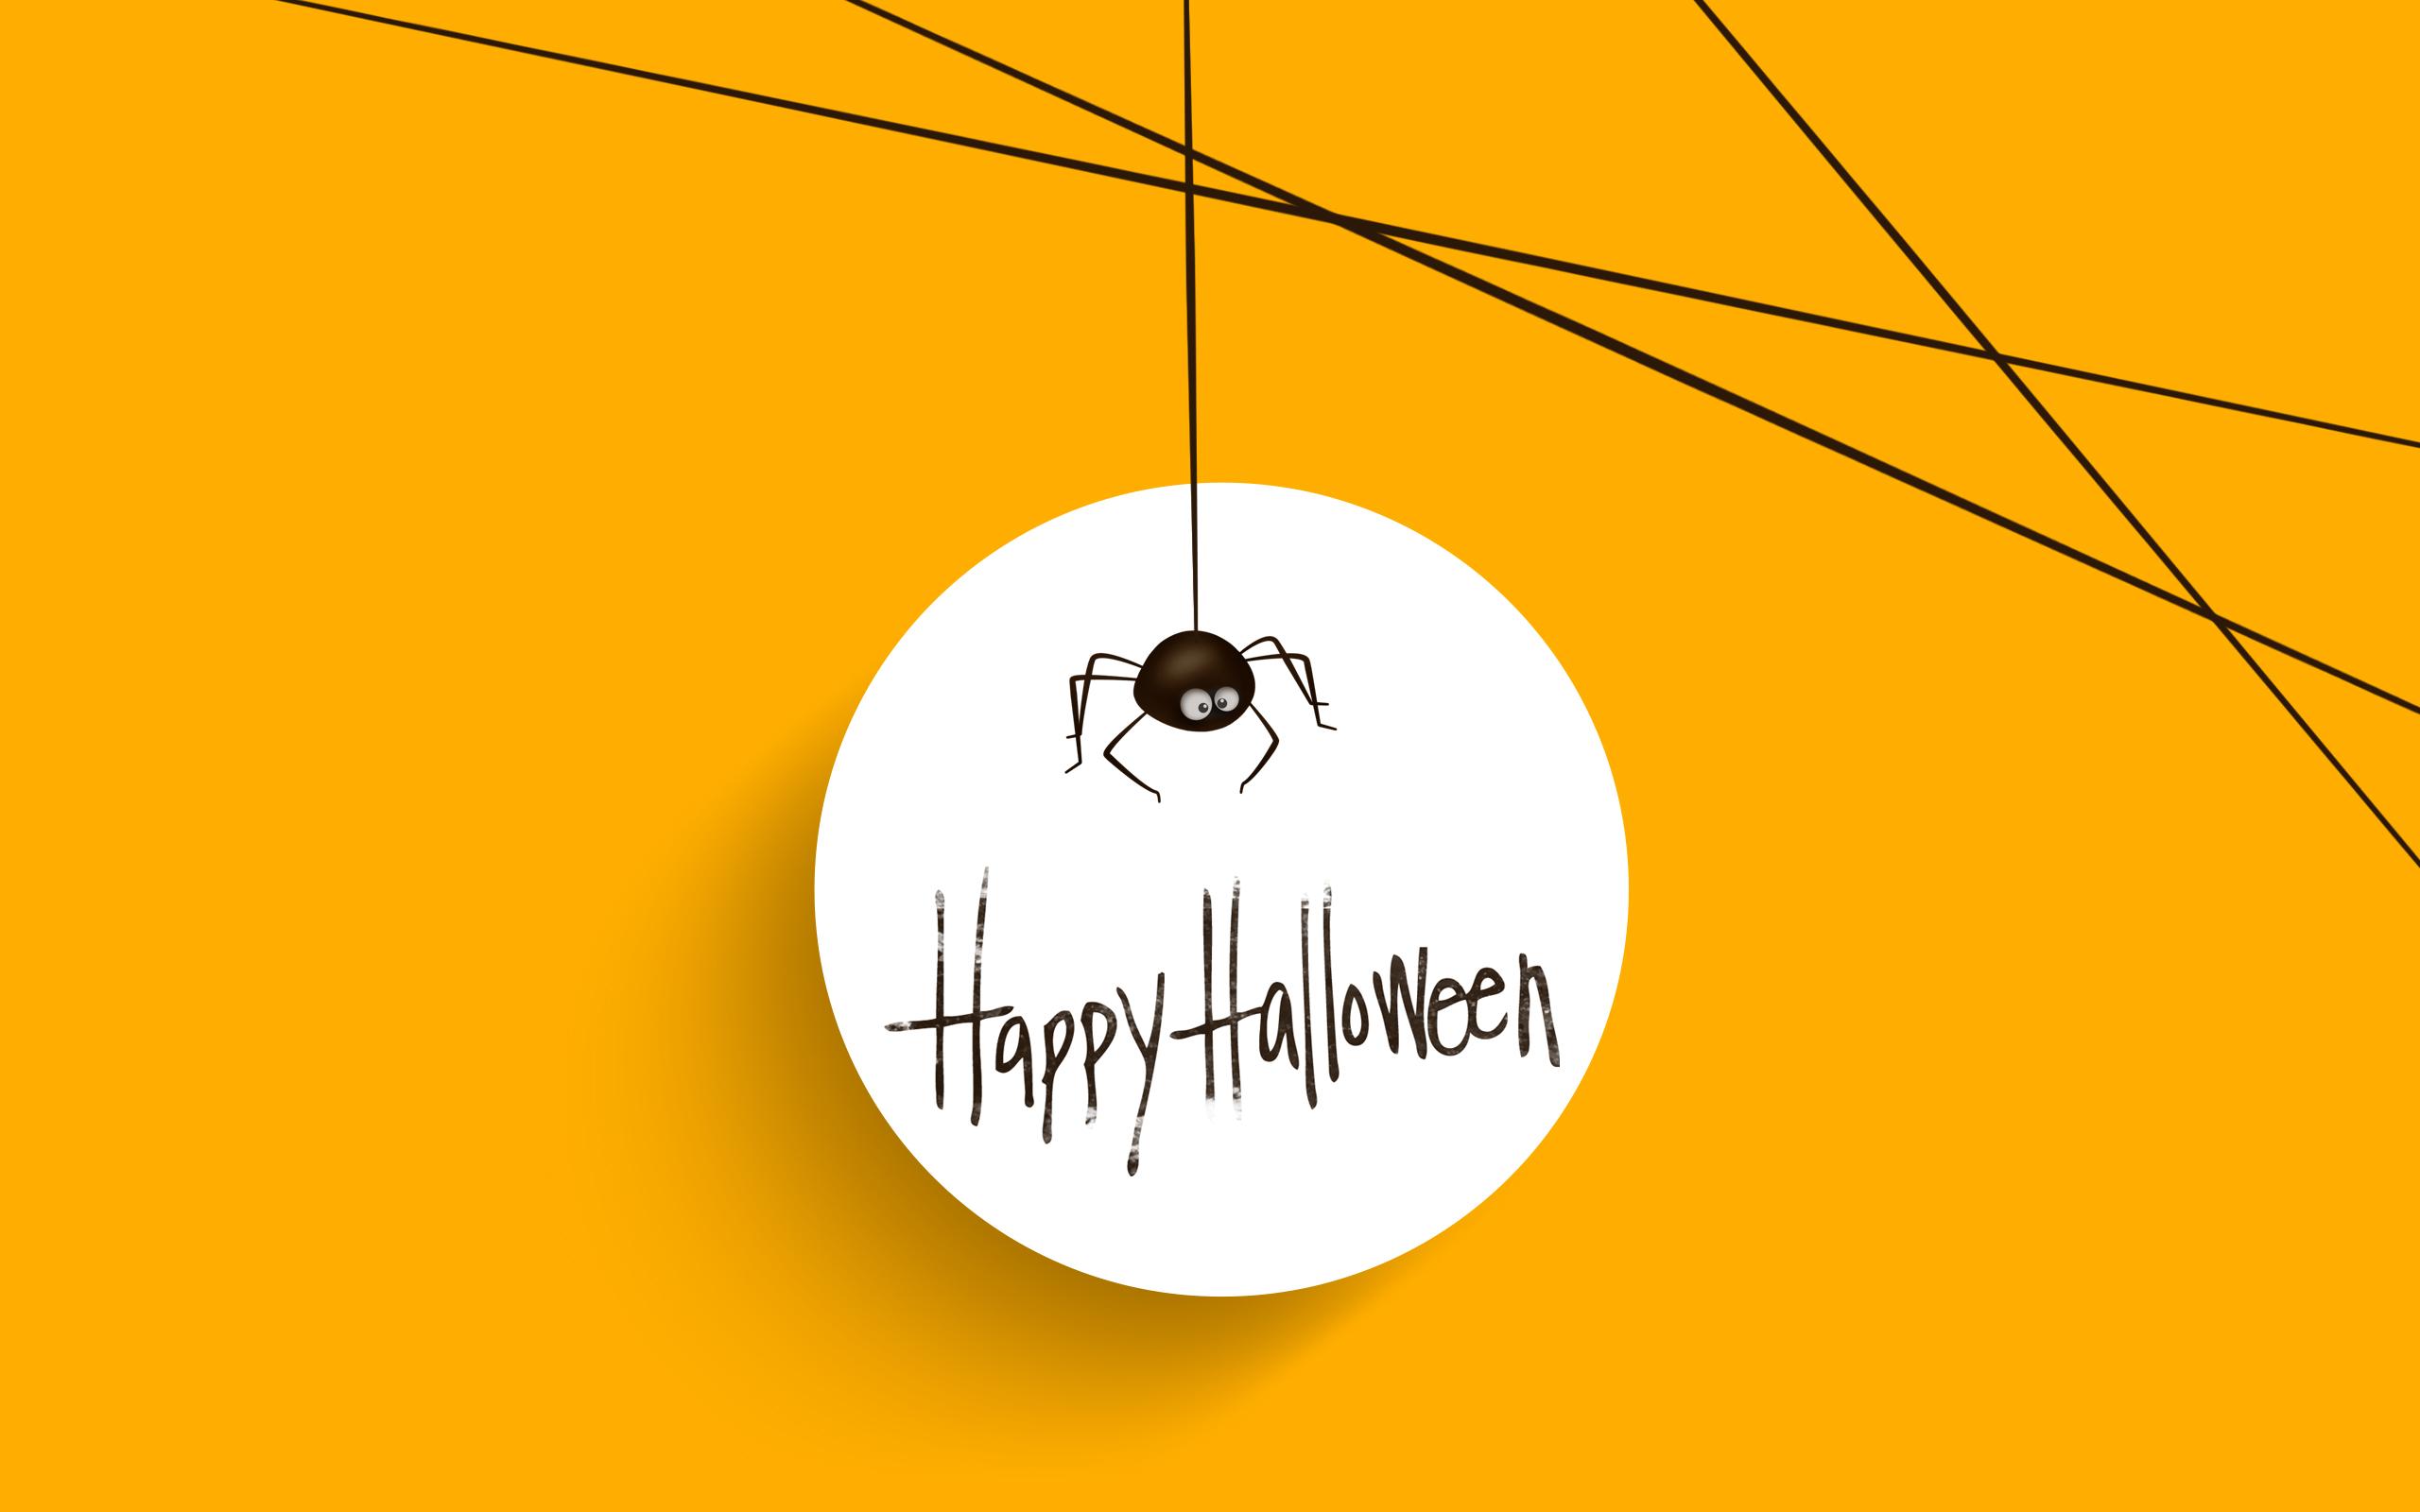 Halloween Wallpaper 2014 by Prince Pal by princepal